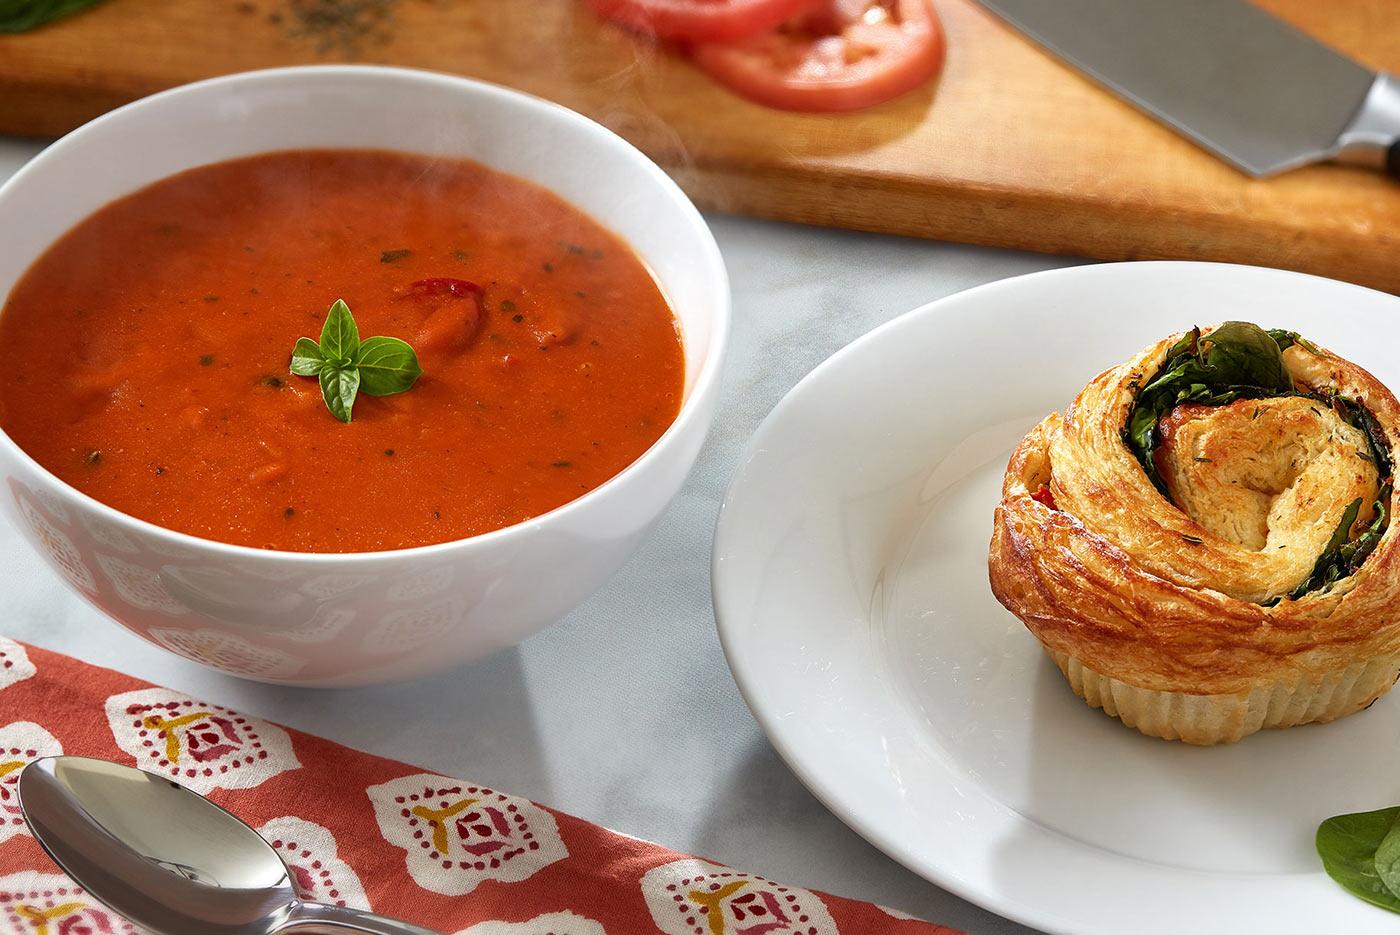 joejenkin-restaurant-photo-soup.jpg